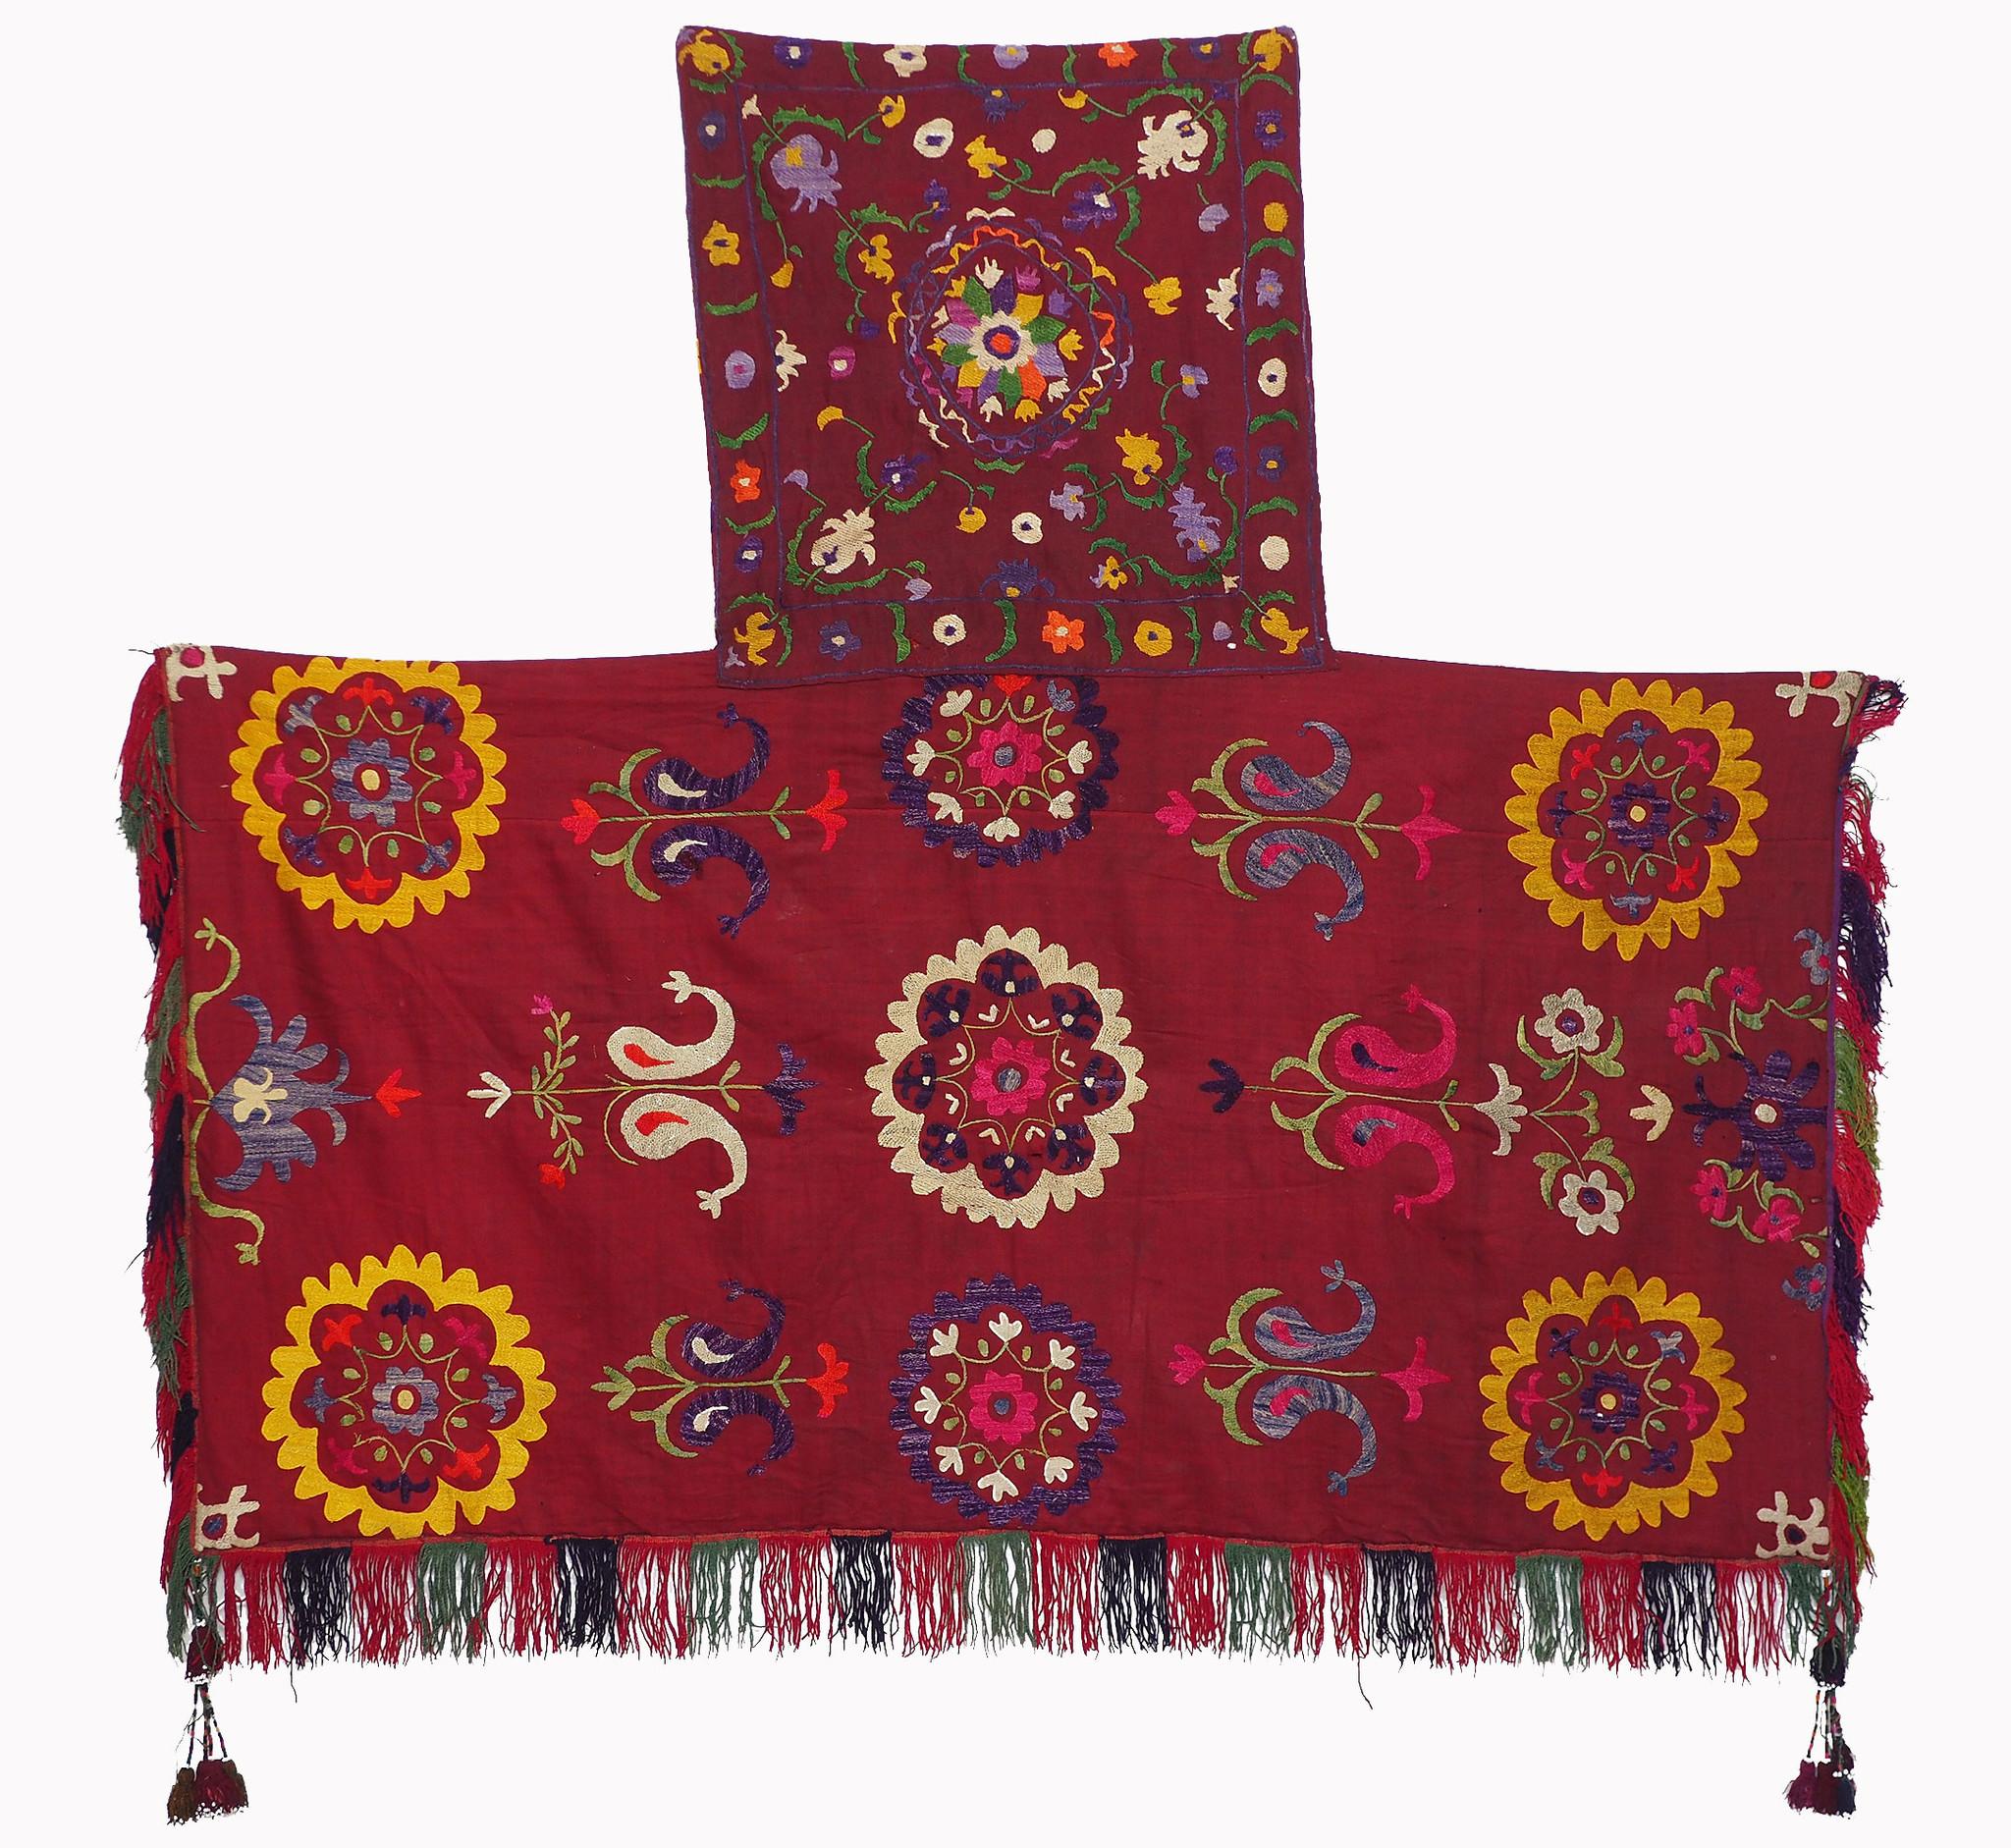 Suzani Wedding Camel flank wandteppich zelttasche Uzbek IT